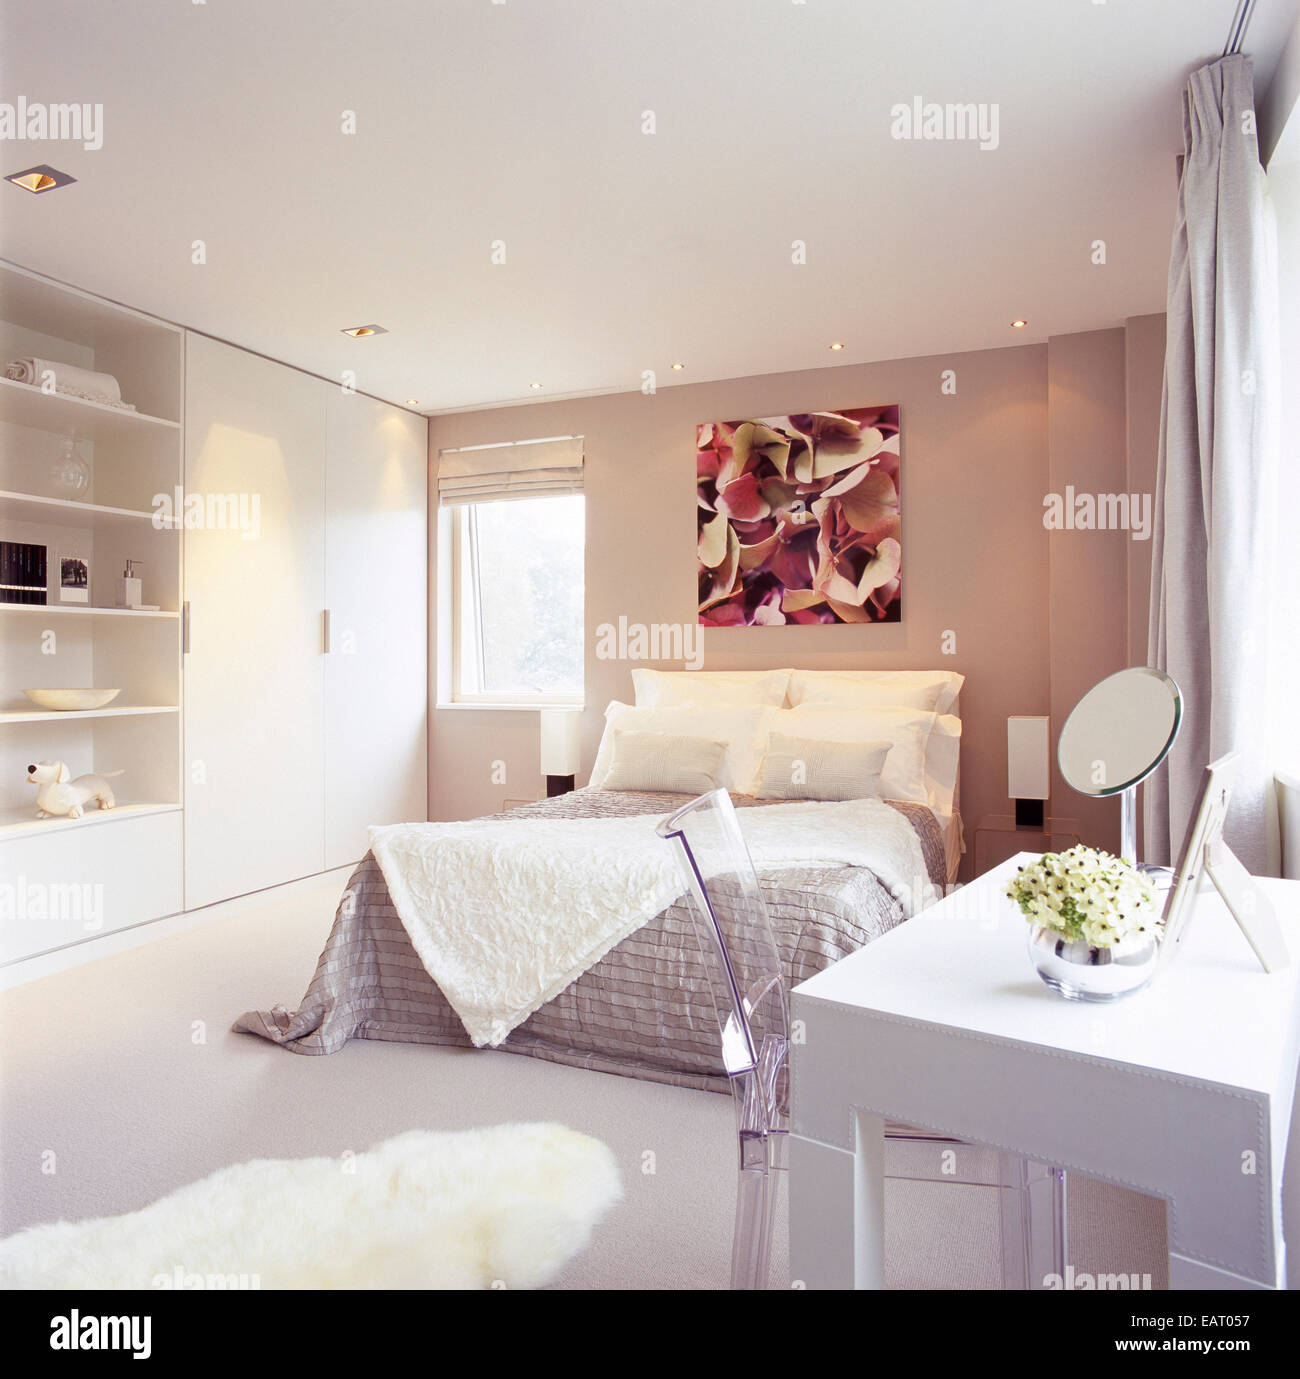 Un moderno dormitorio con cama doble tocador con silla de perspex transparente armario - Tocador moderno dormitorio ...